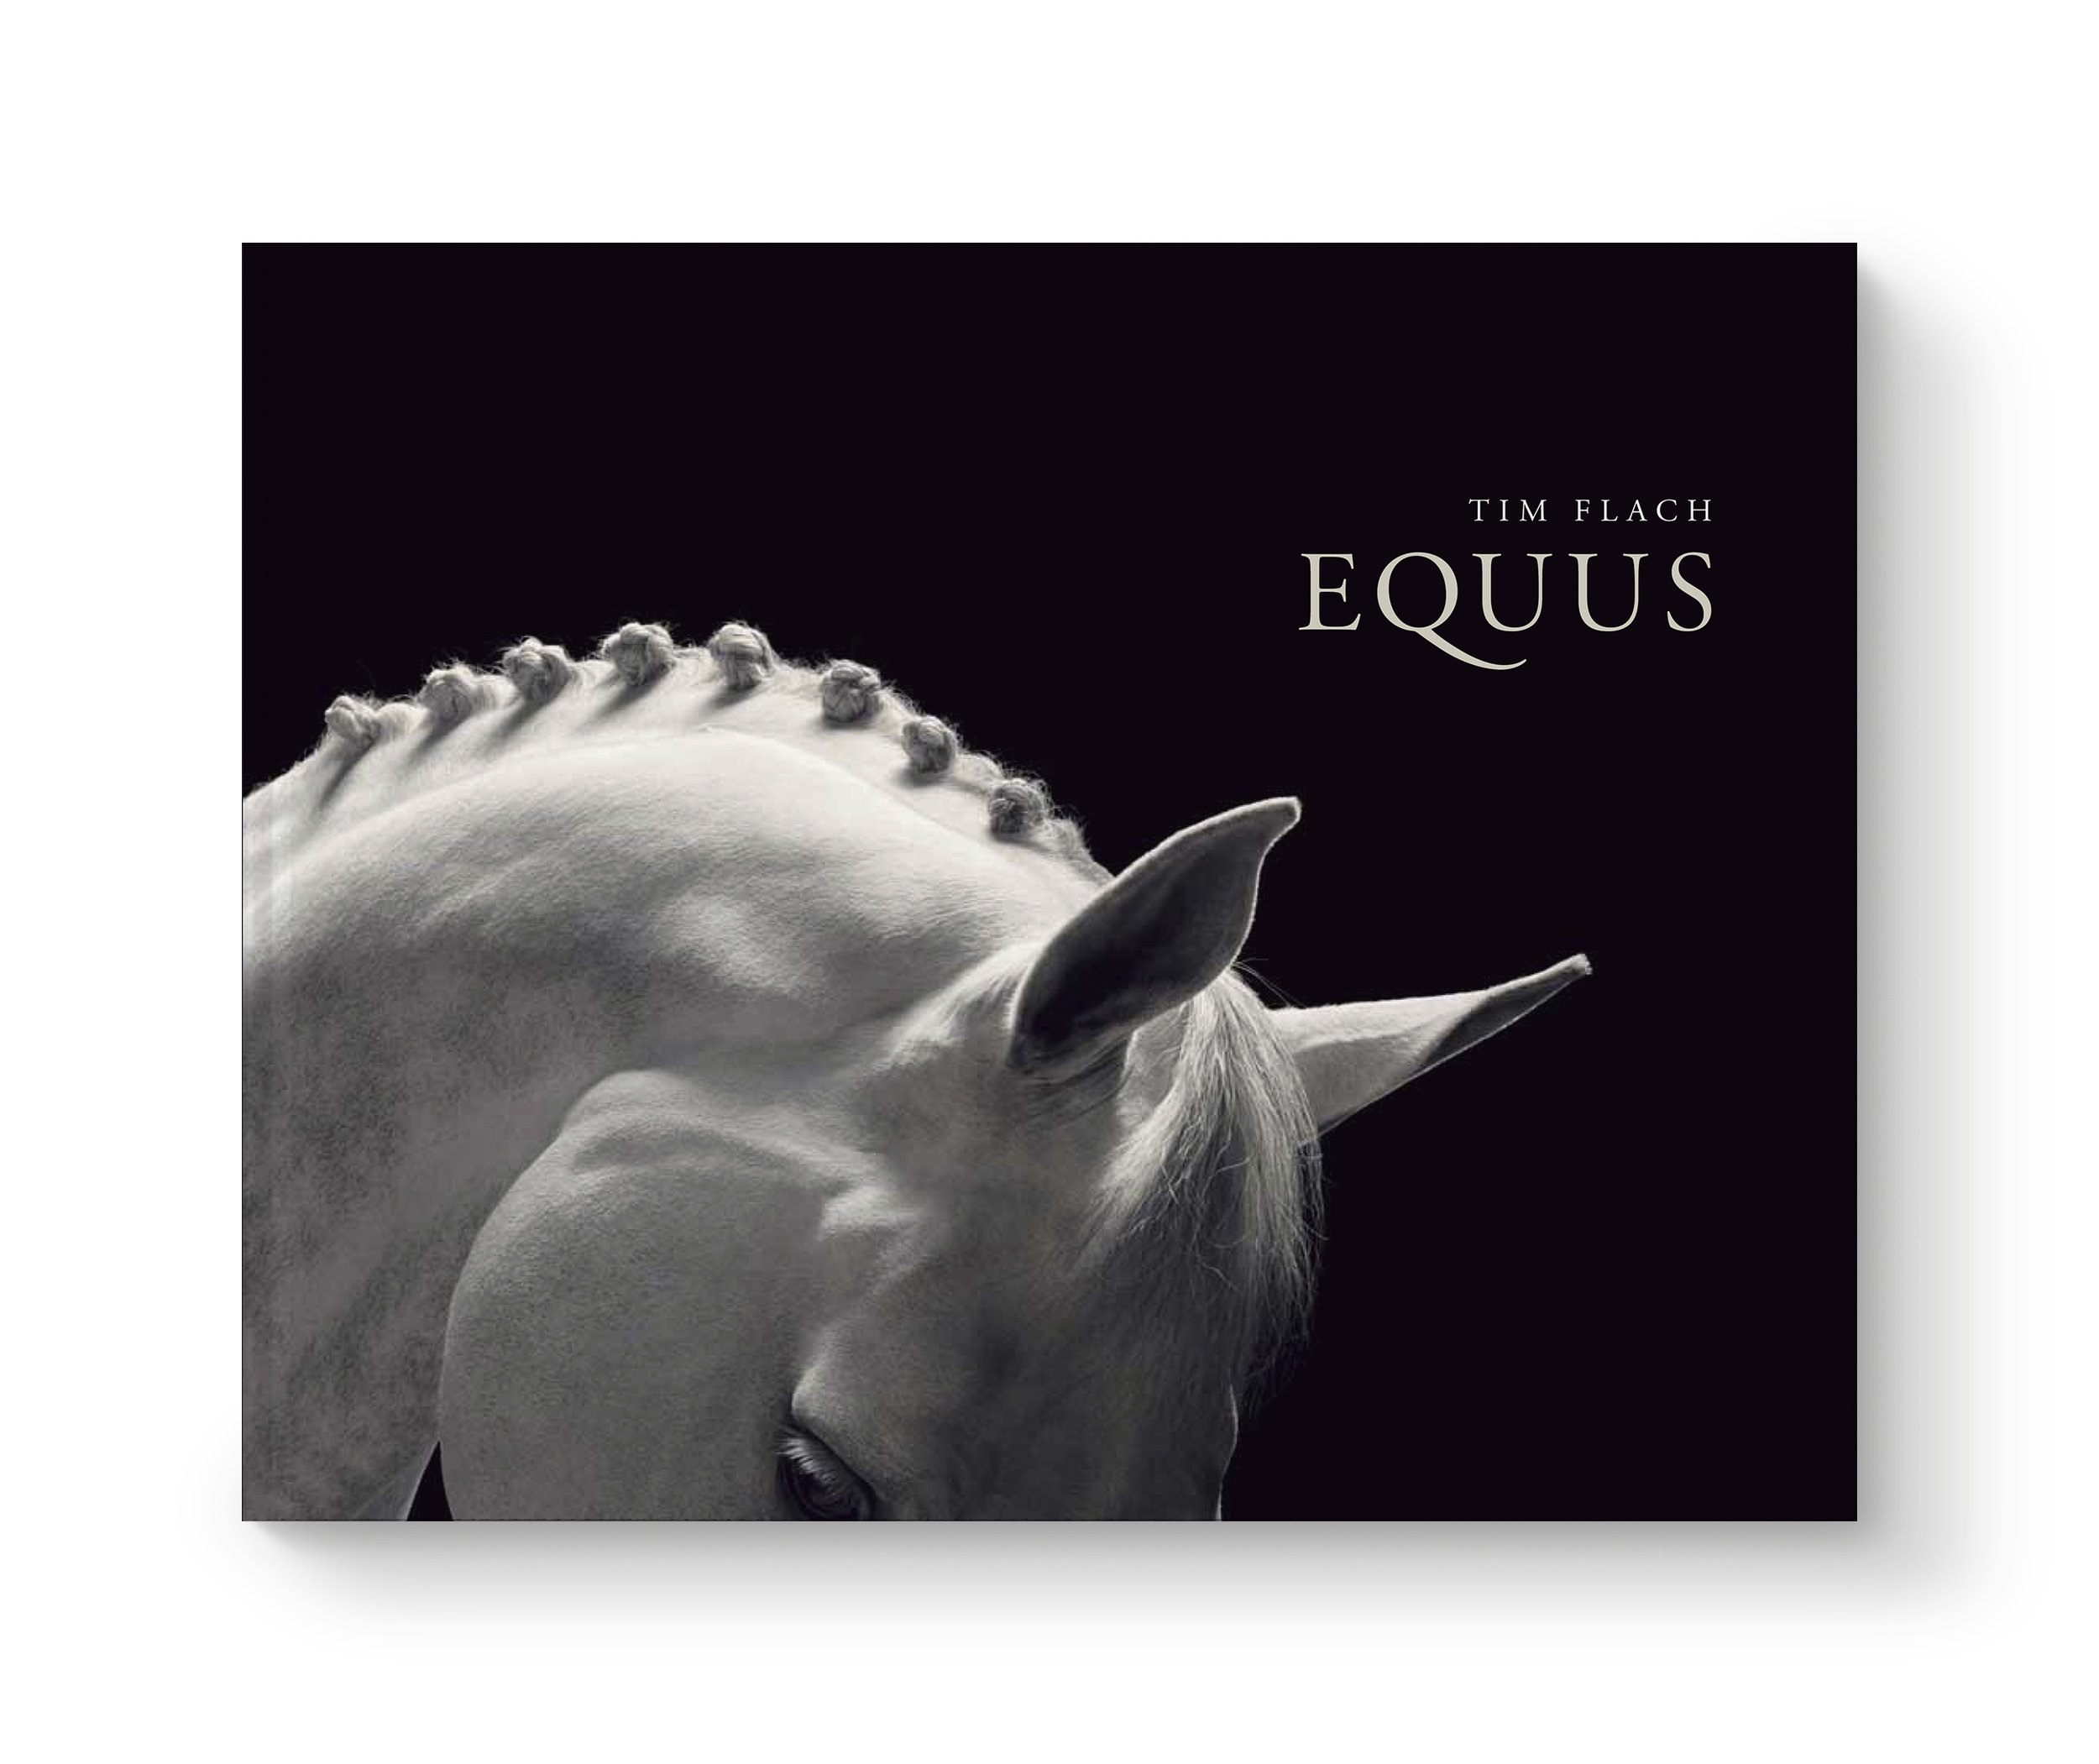 tf-equus-jkt.jpg